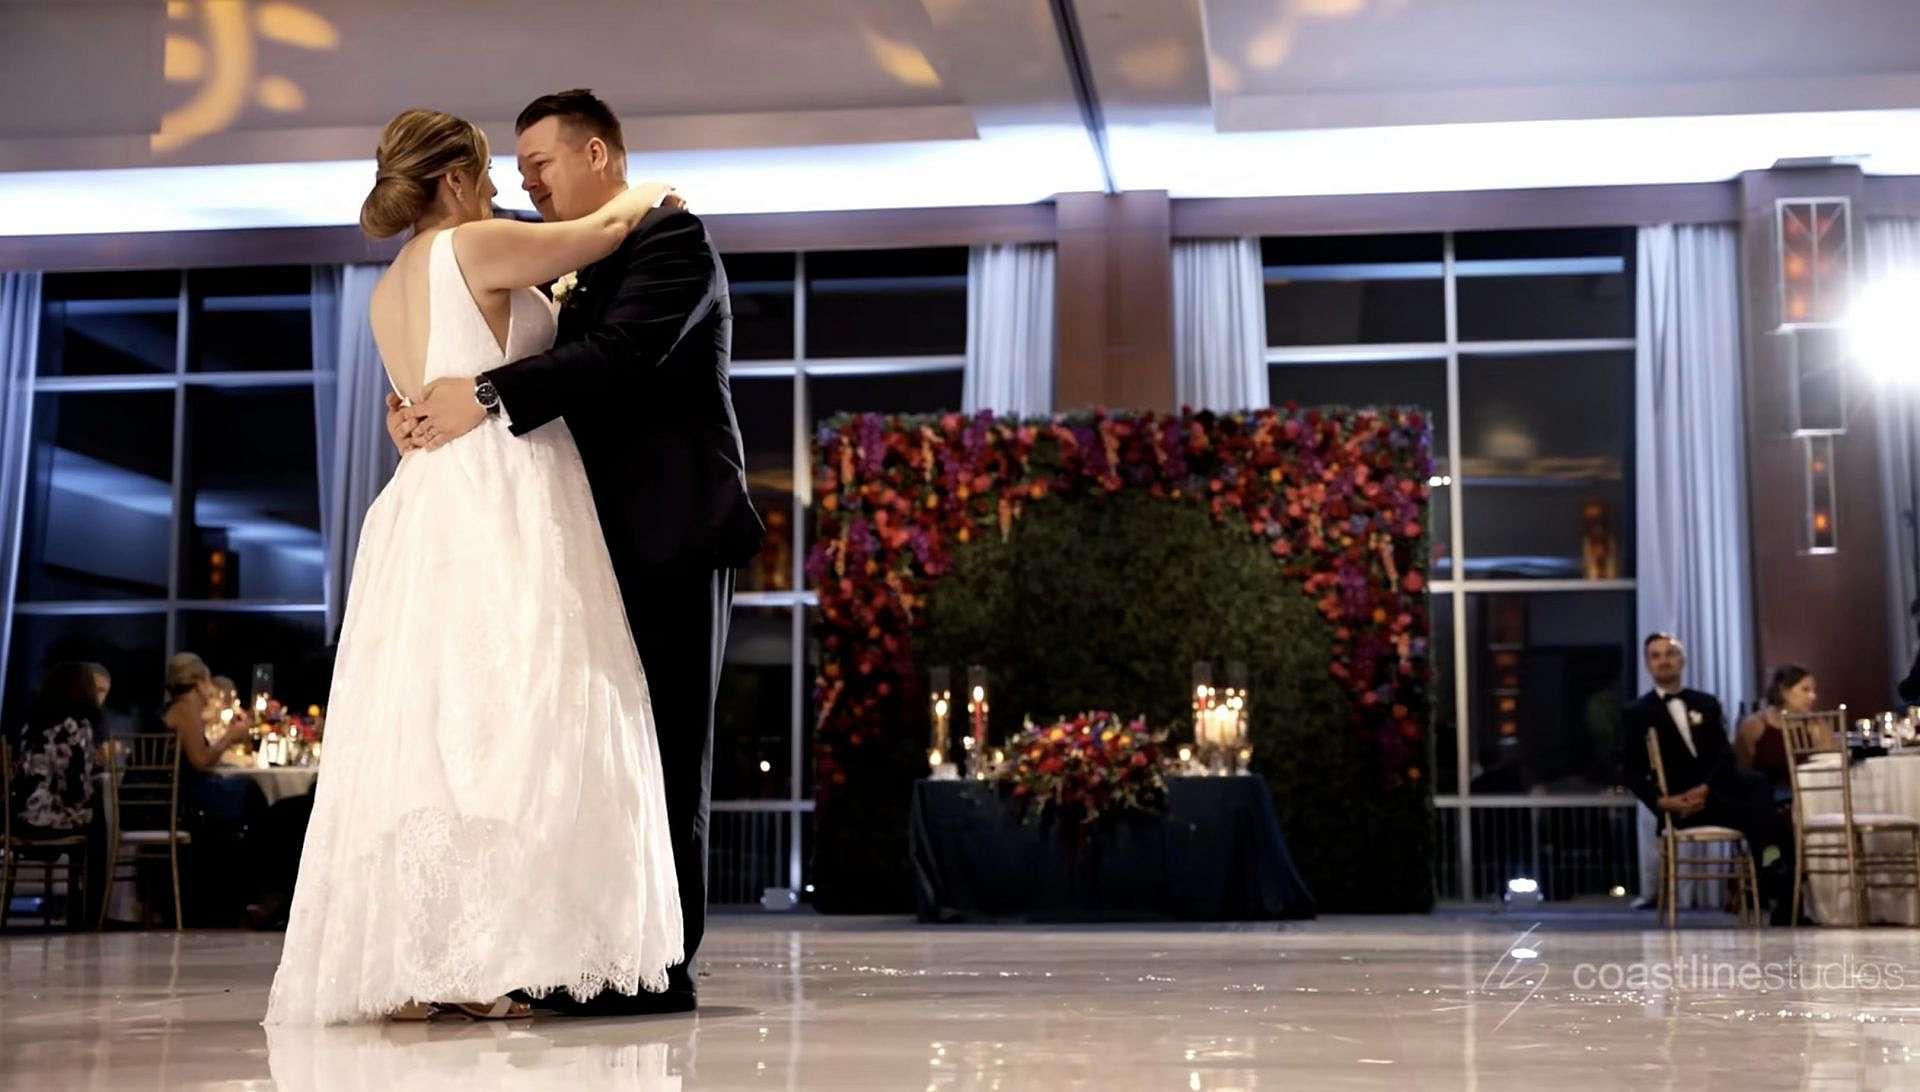 Stunning Golf Course Wedding & Firework Show at Eaglewood Resort, IL